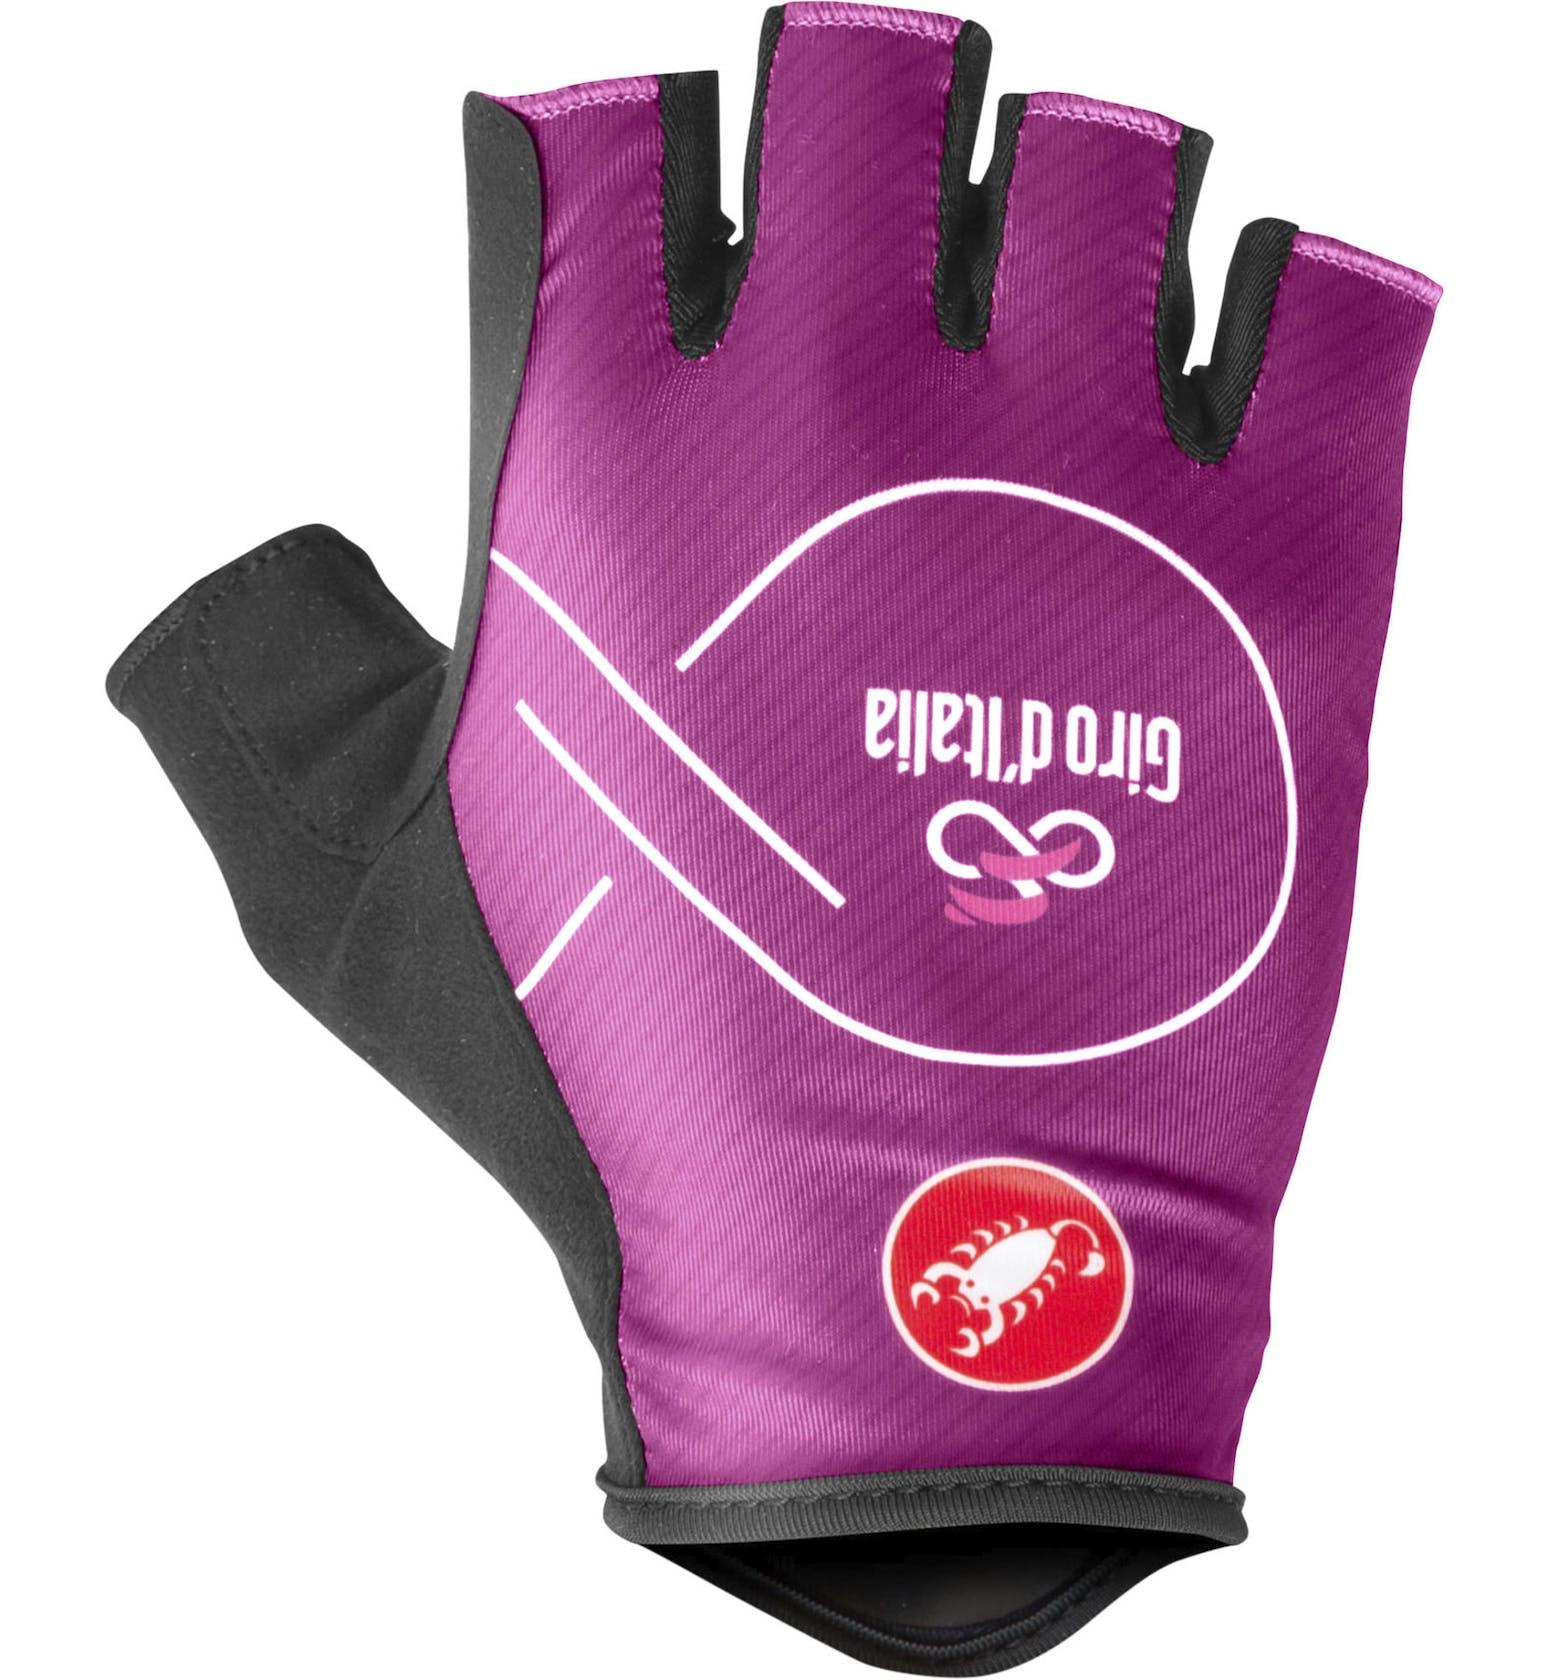 CASTELLI Bike Gloves Giro D'Italia